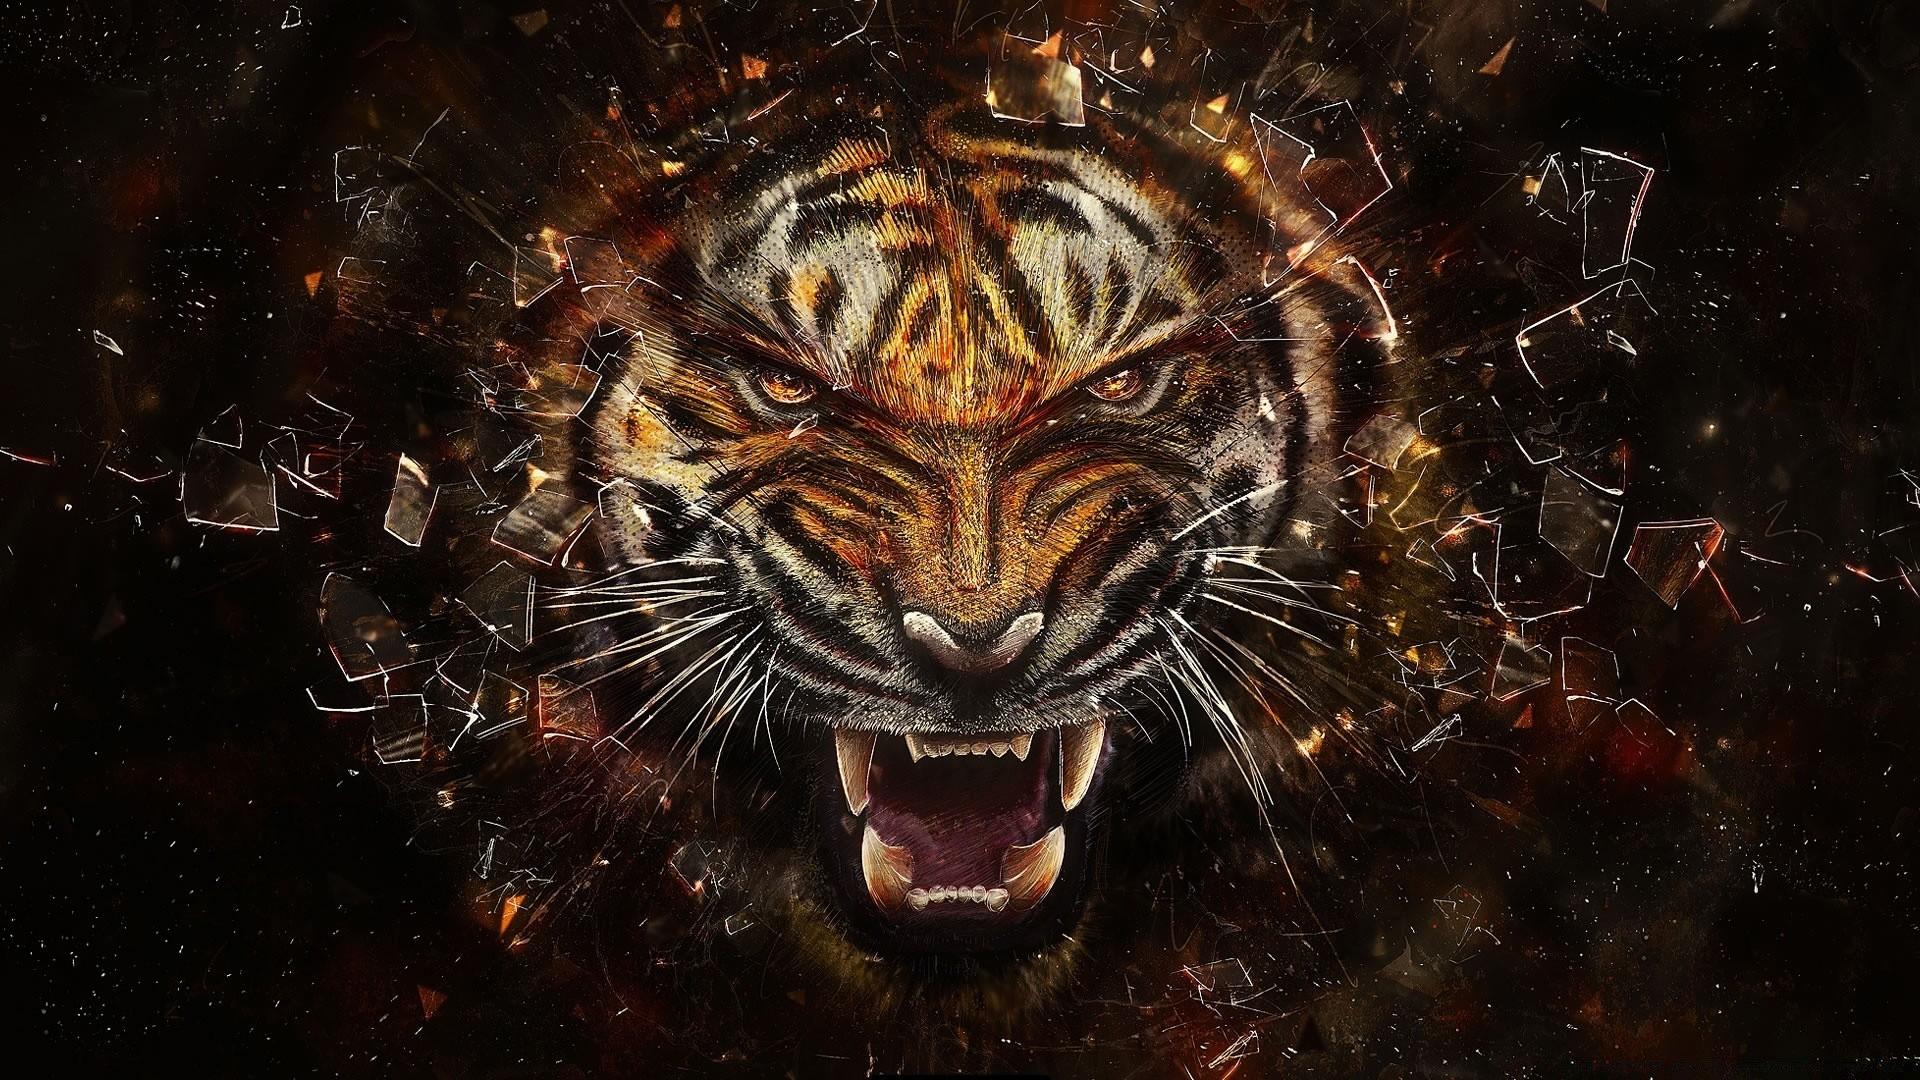 tiger backgrounds. desktop wallpapers for free.